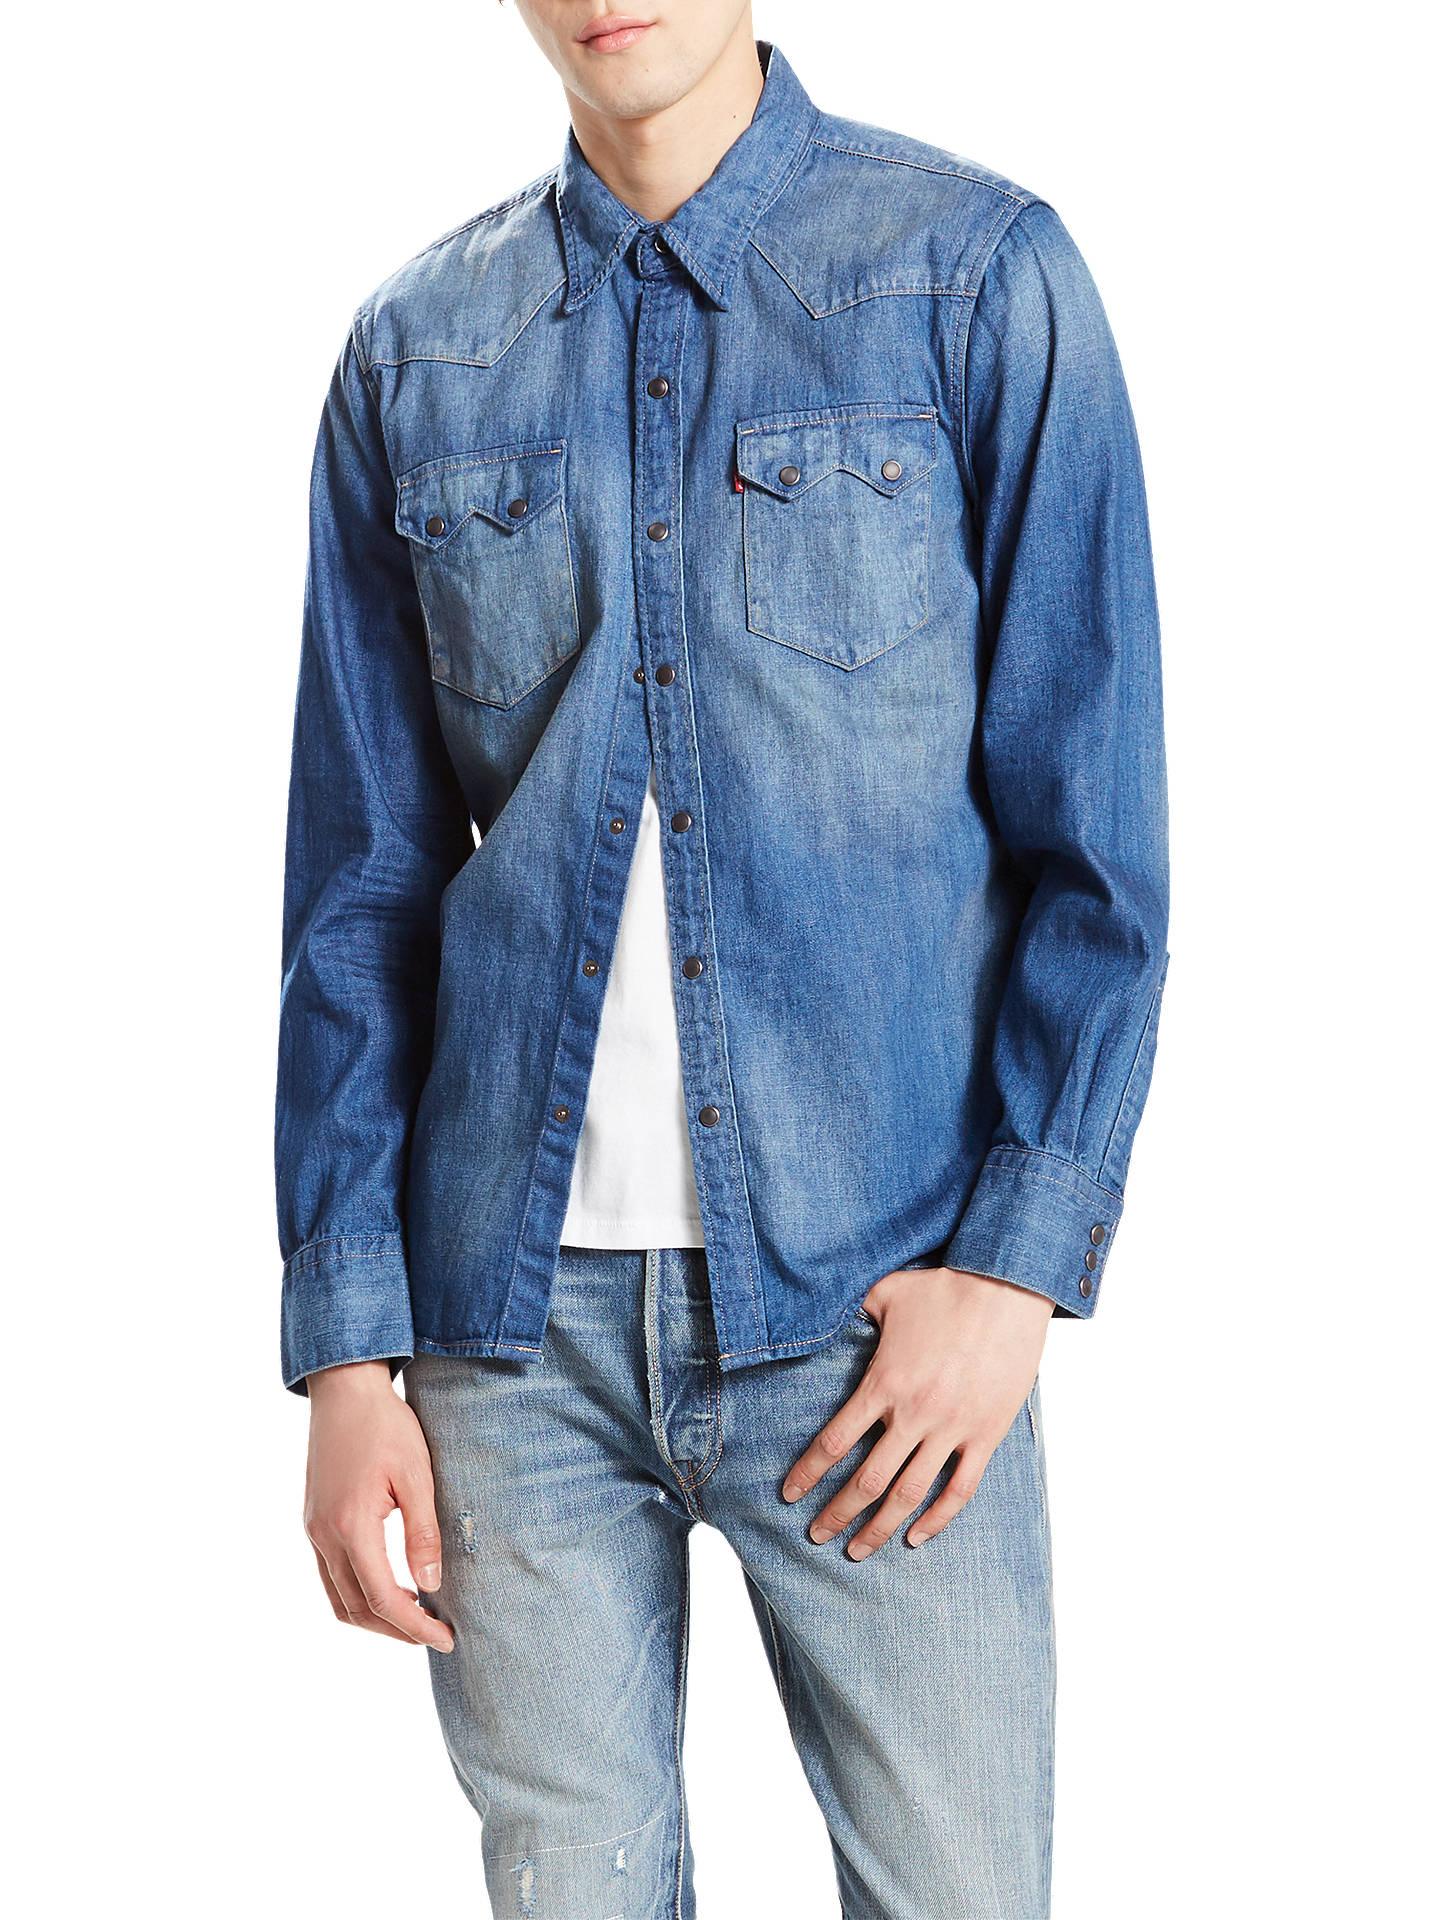 5ee1ebfb98 Buy Levi s Sawtooth Western Shirt